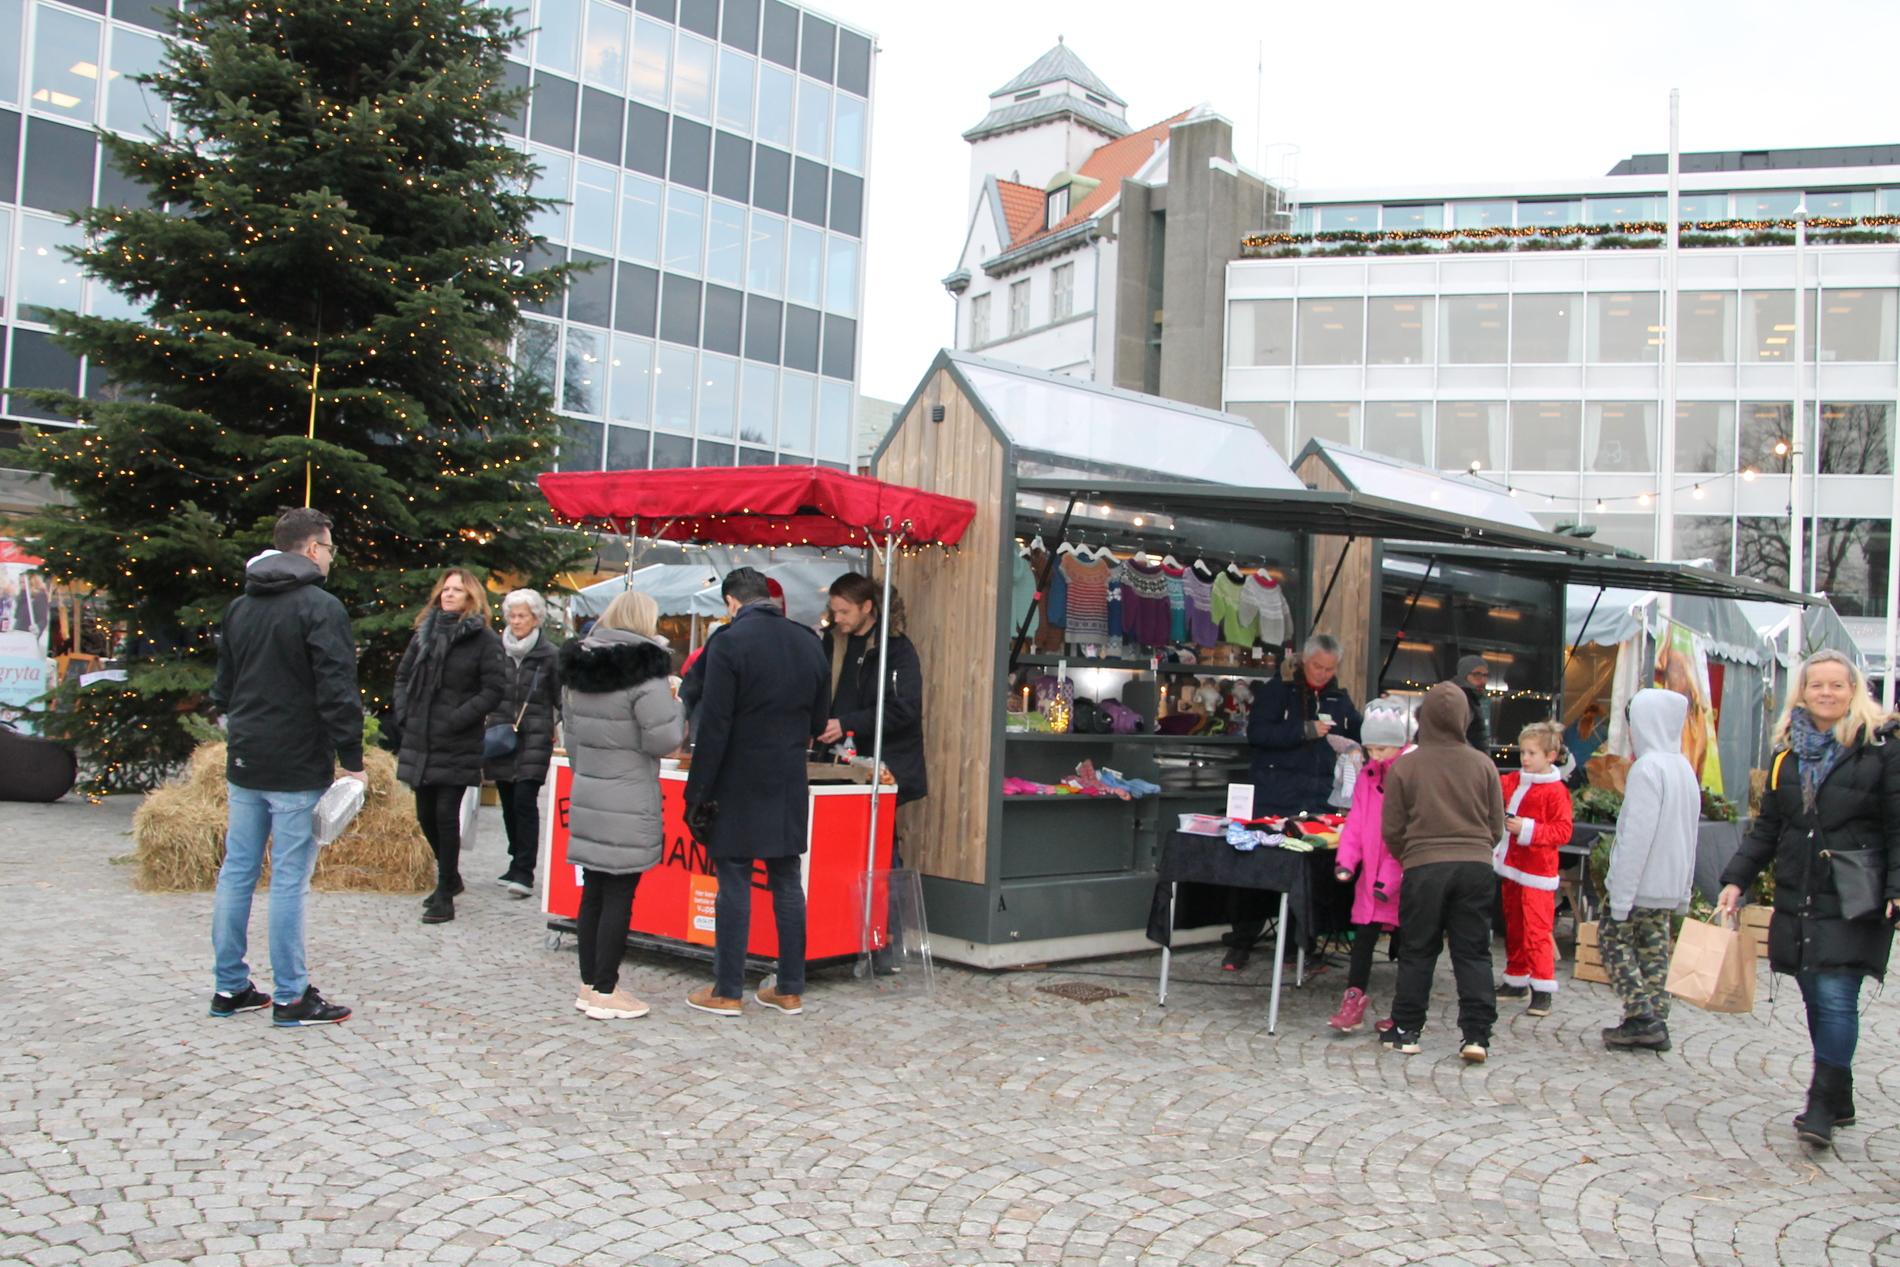 Julemarked i Byparken og på Domkirkeplassen